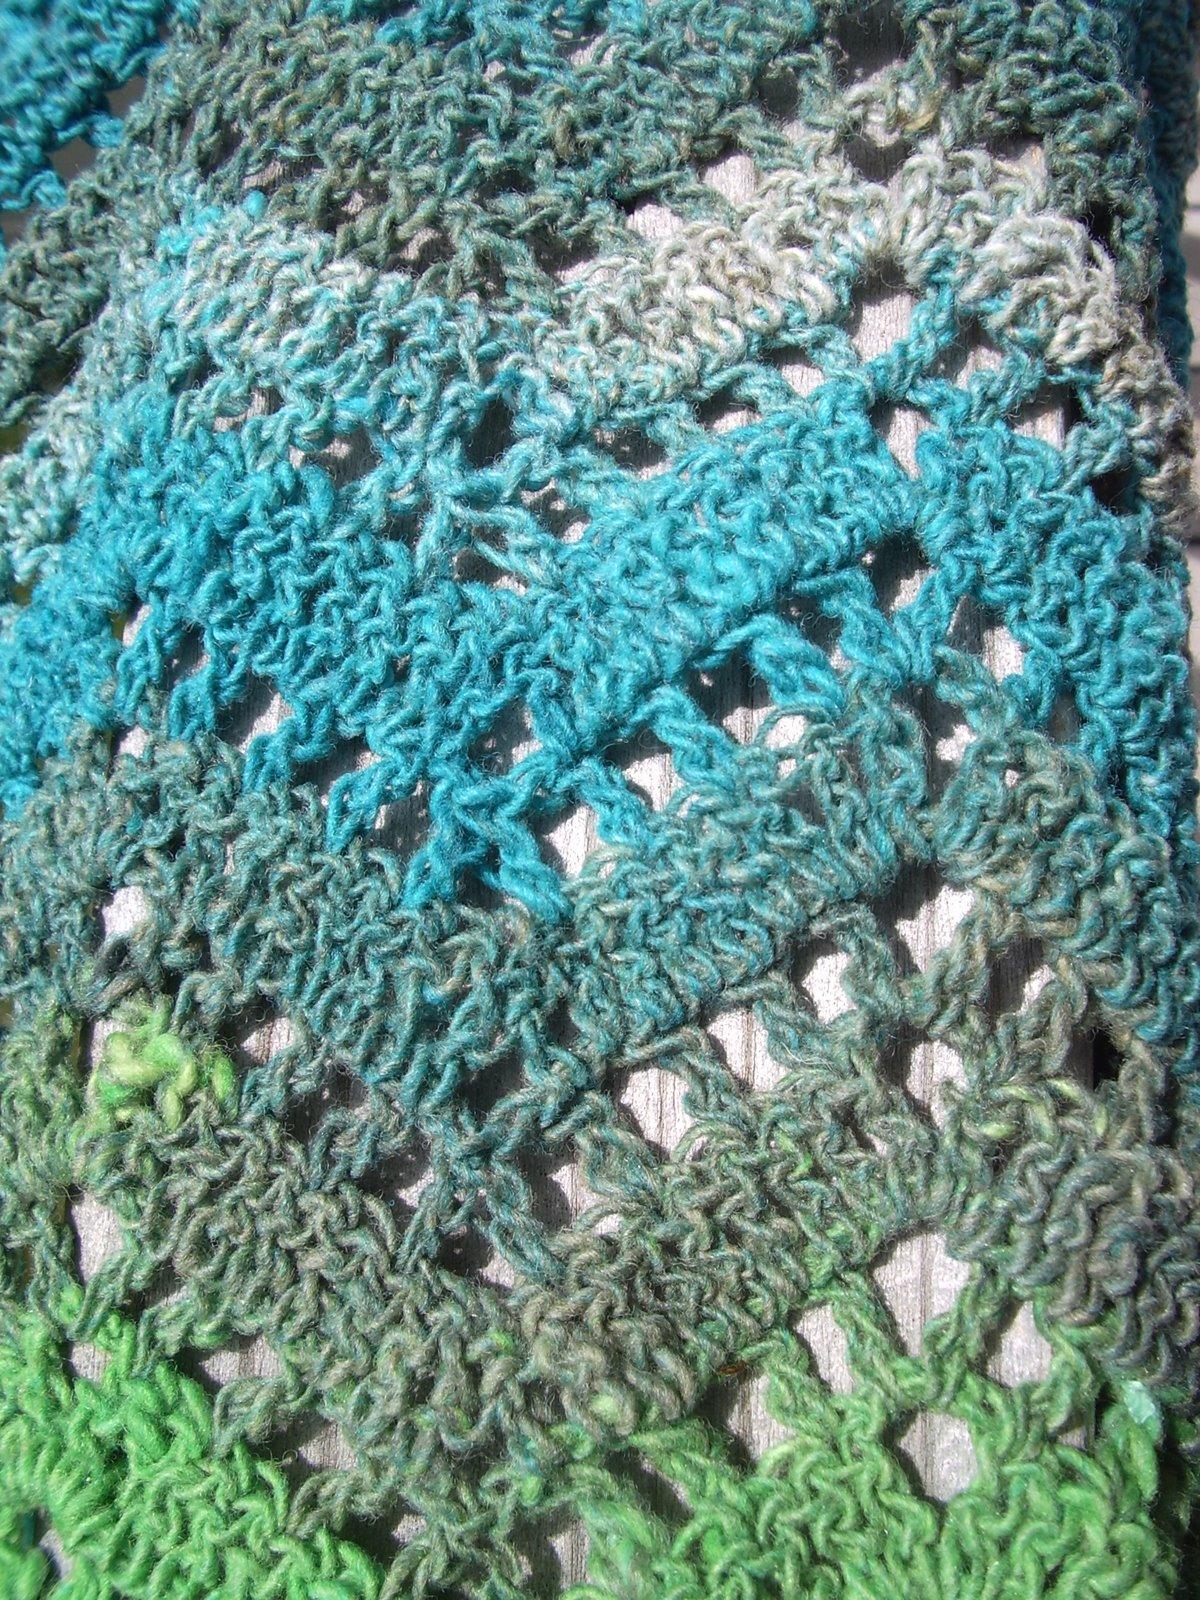 In-Progress Crochet Posts – That Crafty Cara